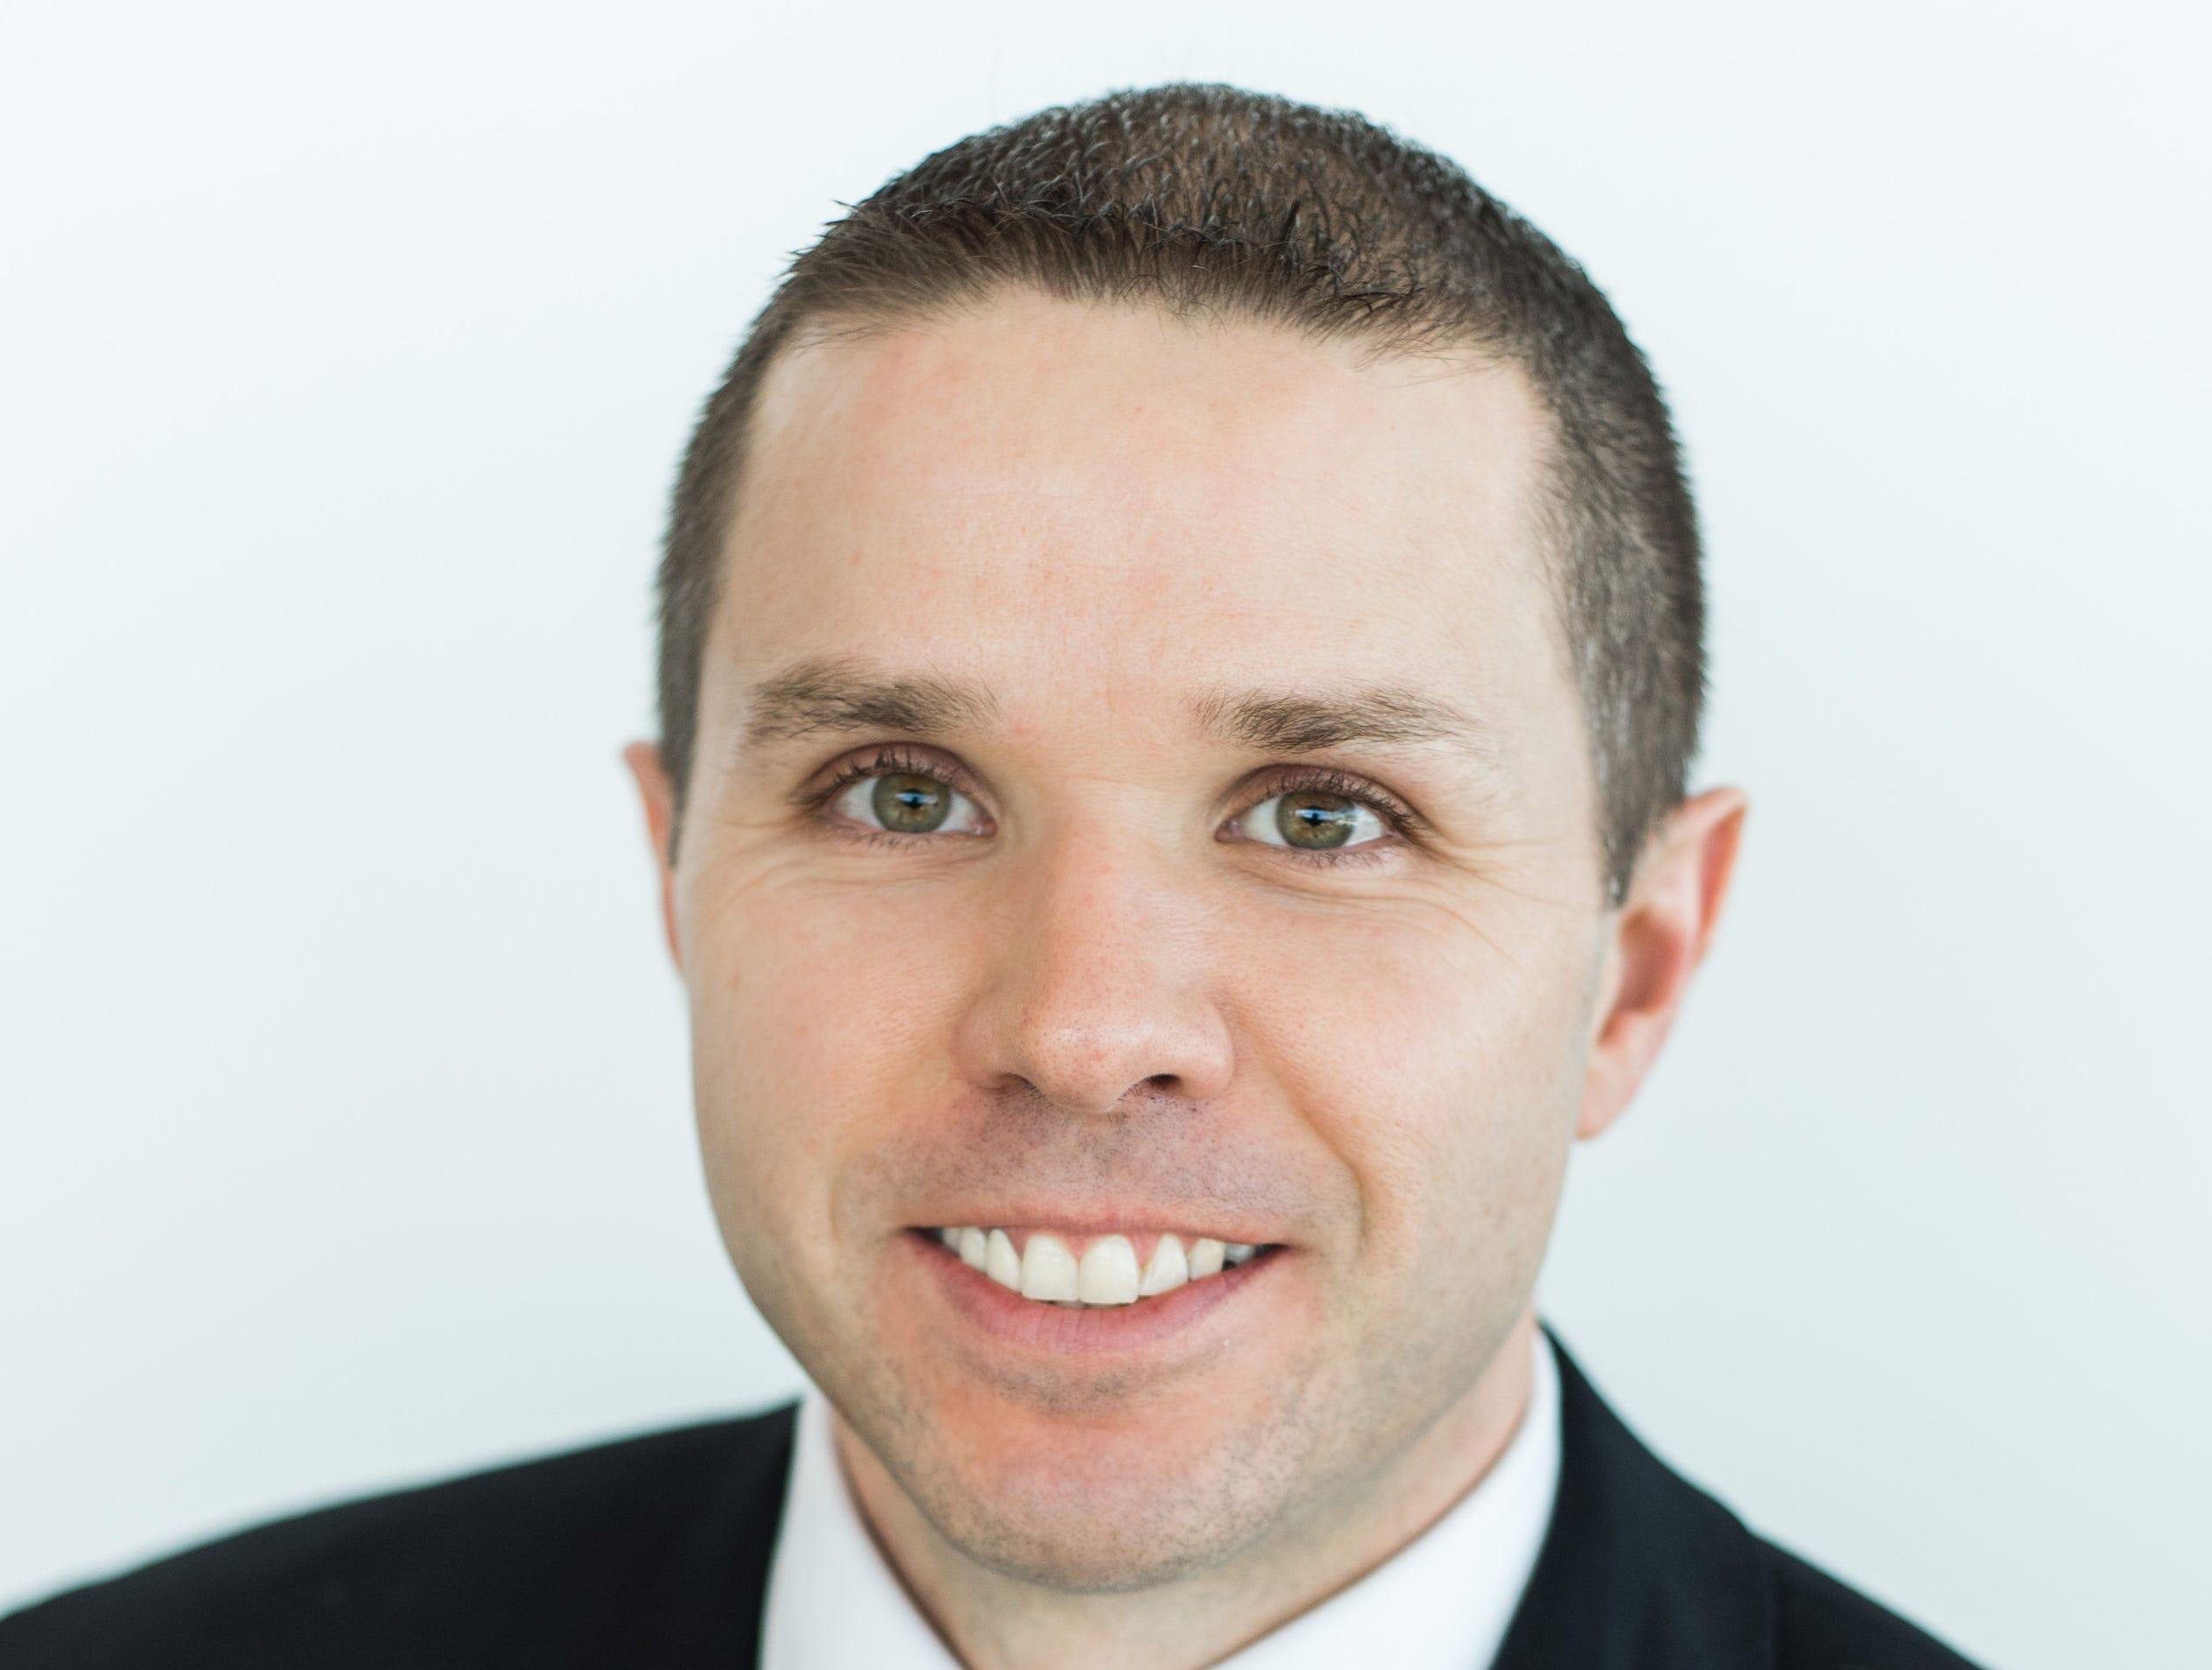 Adam Mutschelknaus